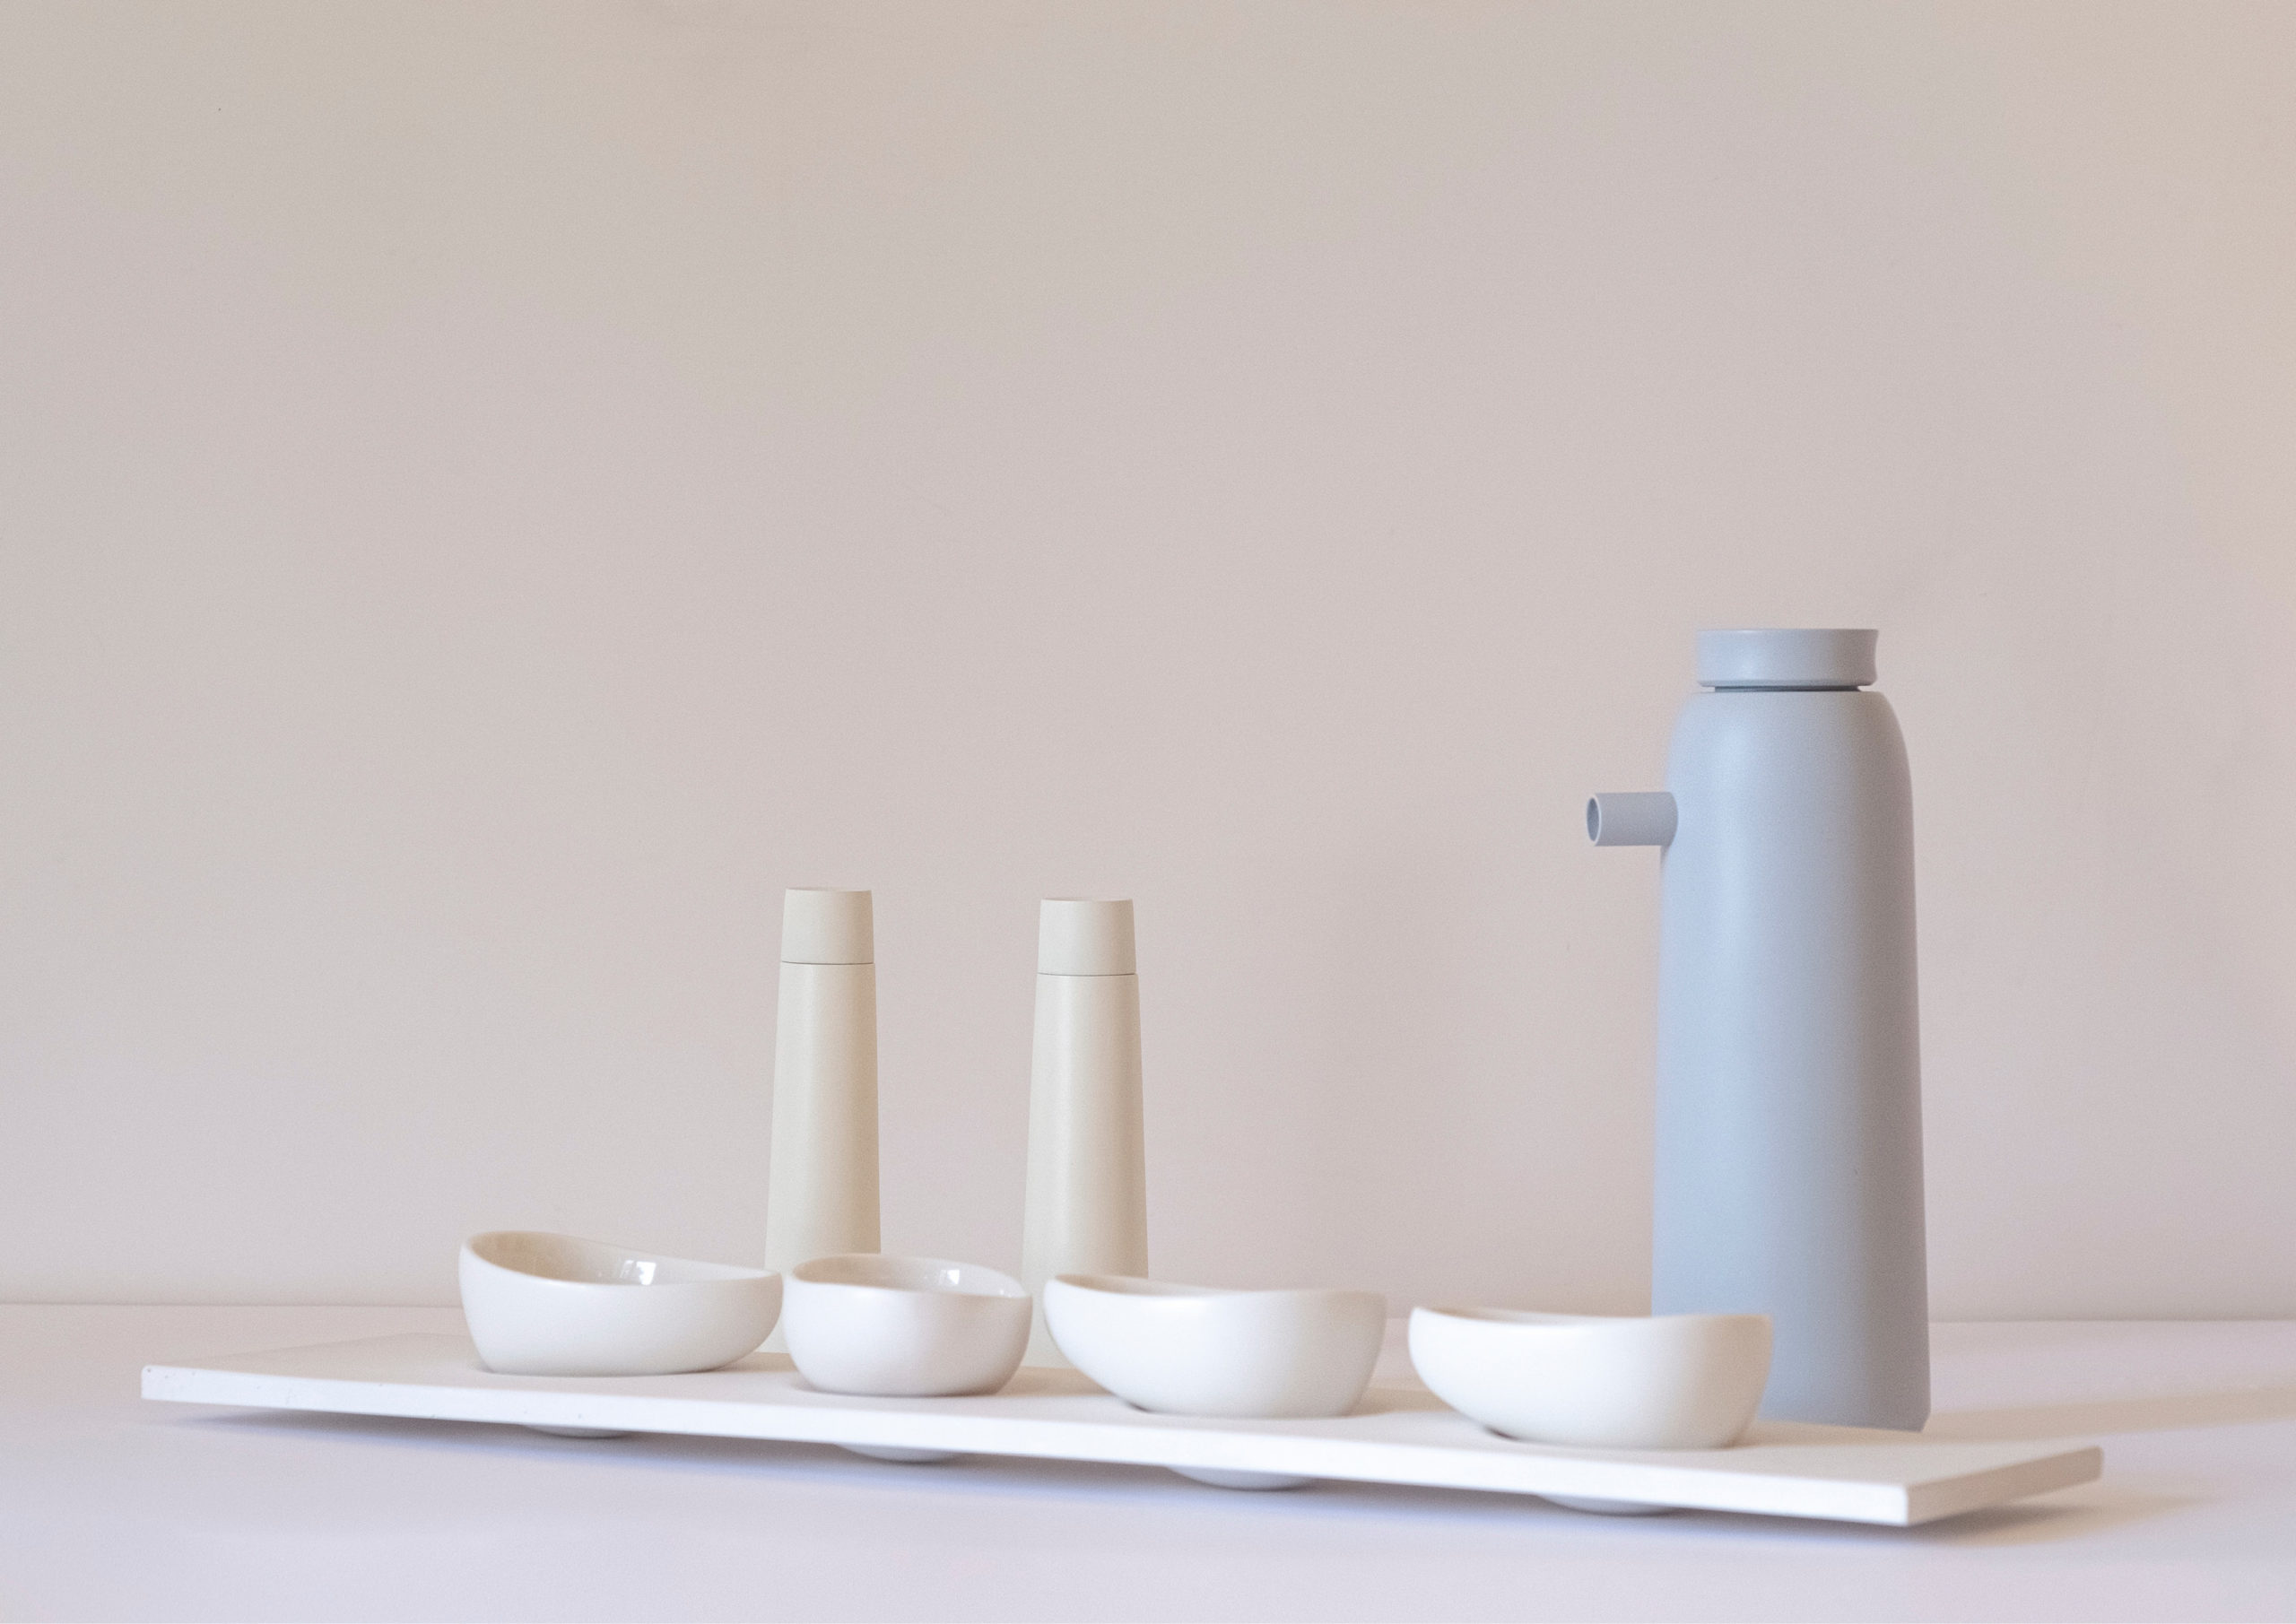 Soundful Tableware